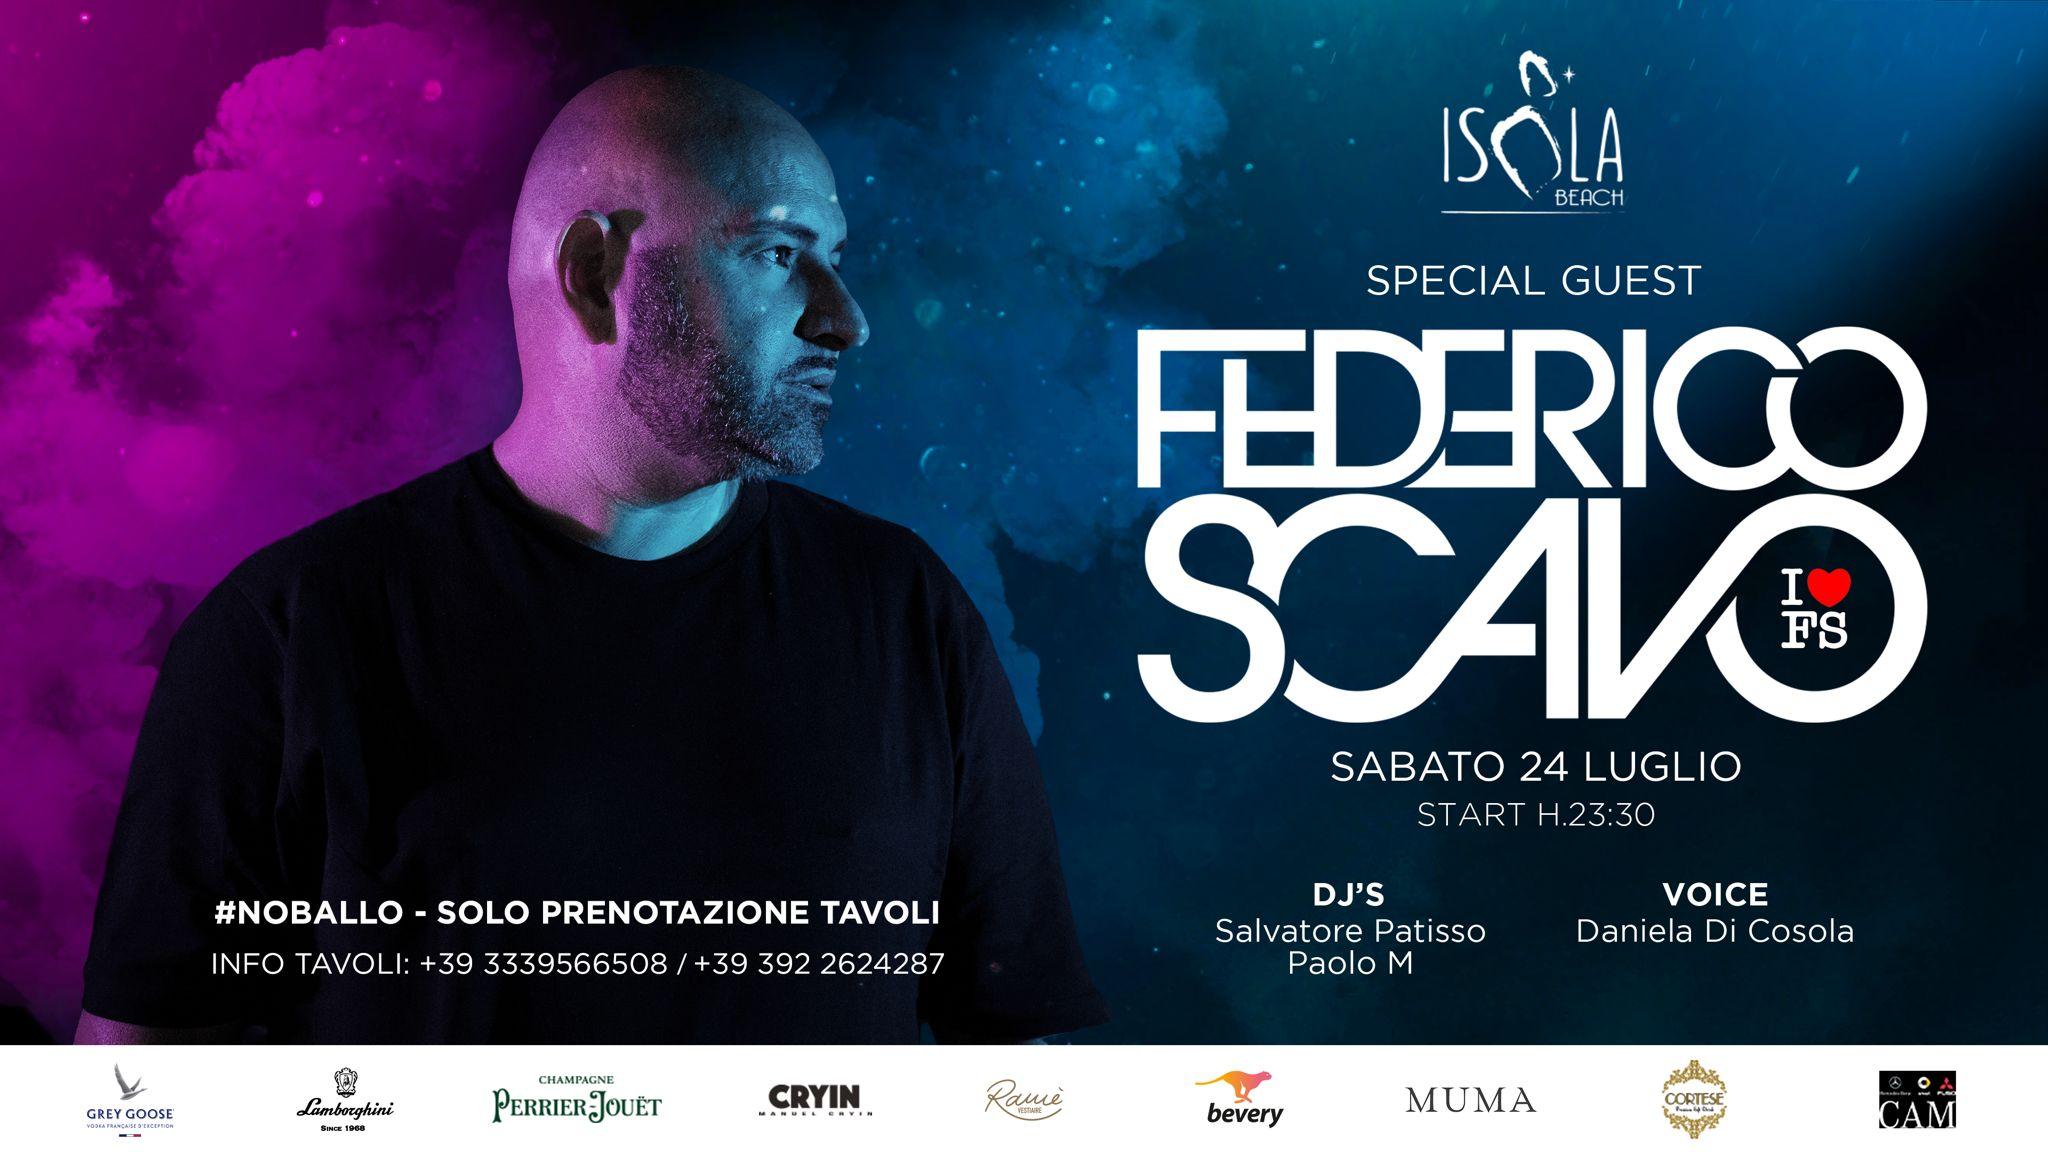 FEDERICO SCAVO | 24.07.21